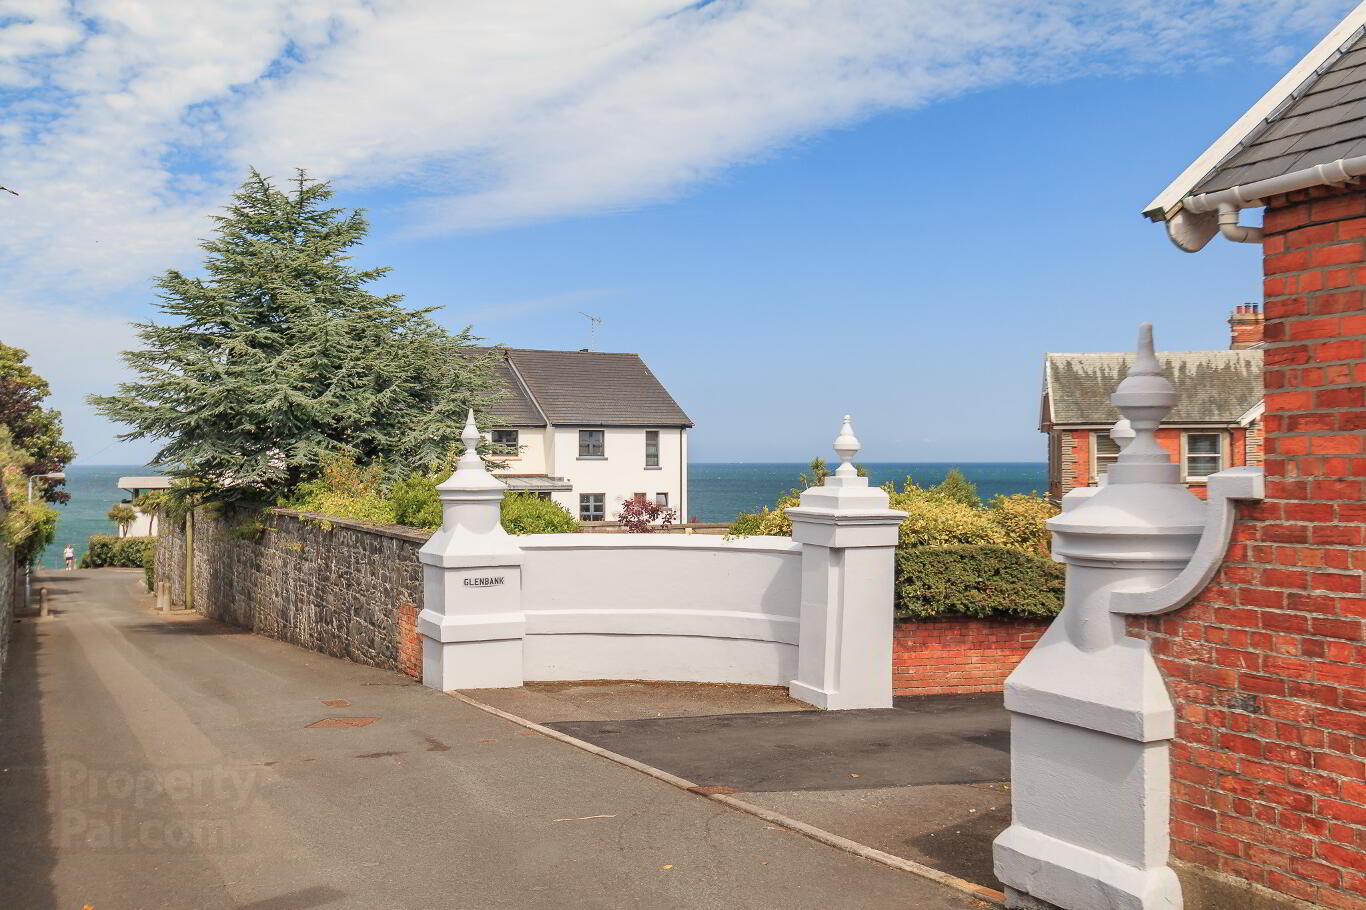 118 Princetown Road Seacourt Lane Bangor Propertypal